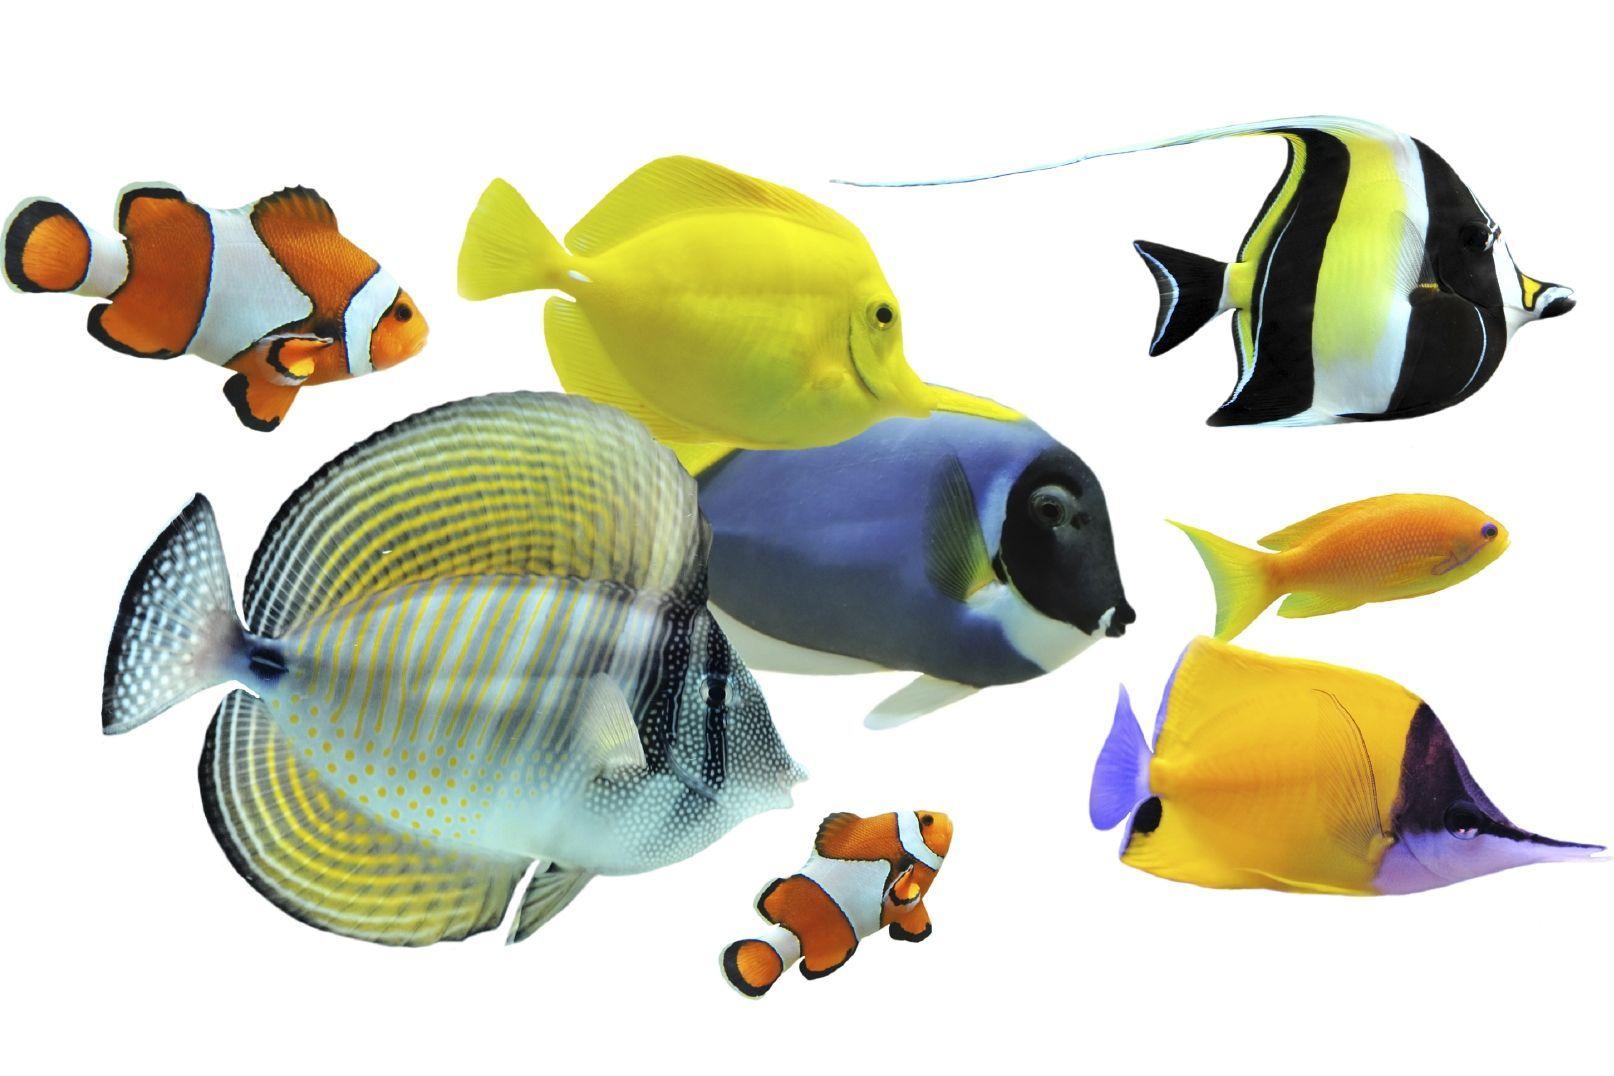 Les principales esp ces de poissons d aquarium doctissimo - Image poissons ...